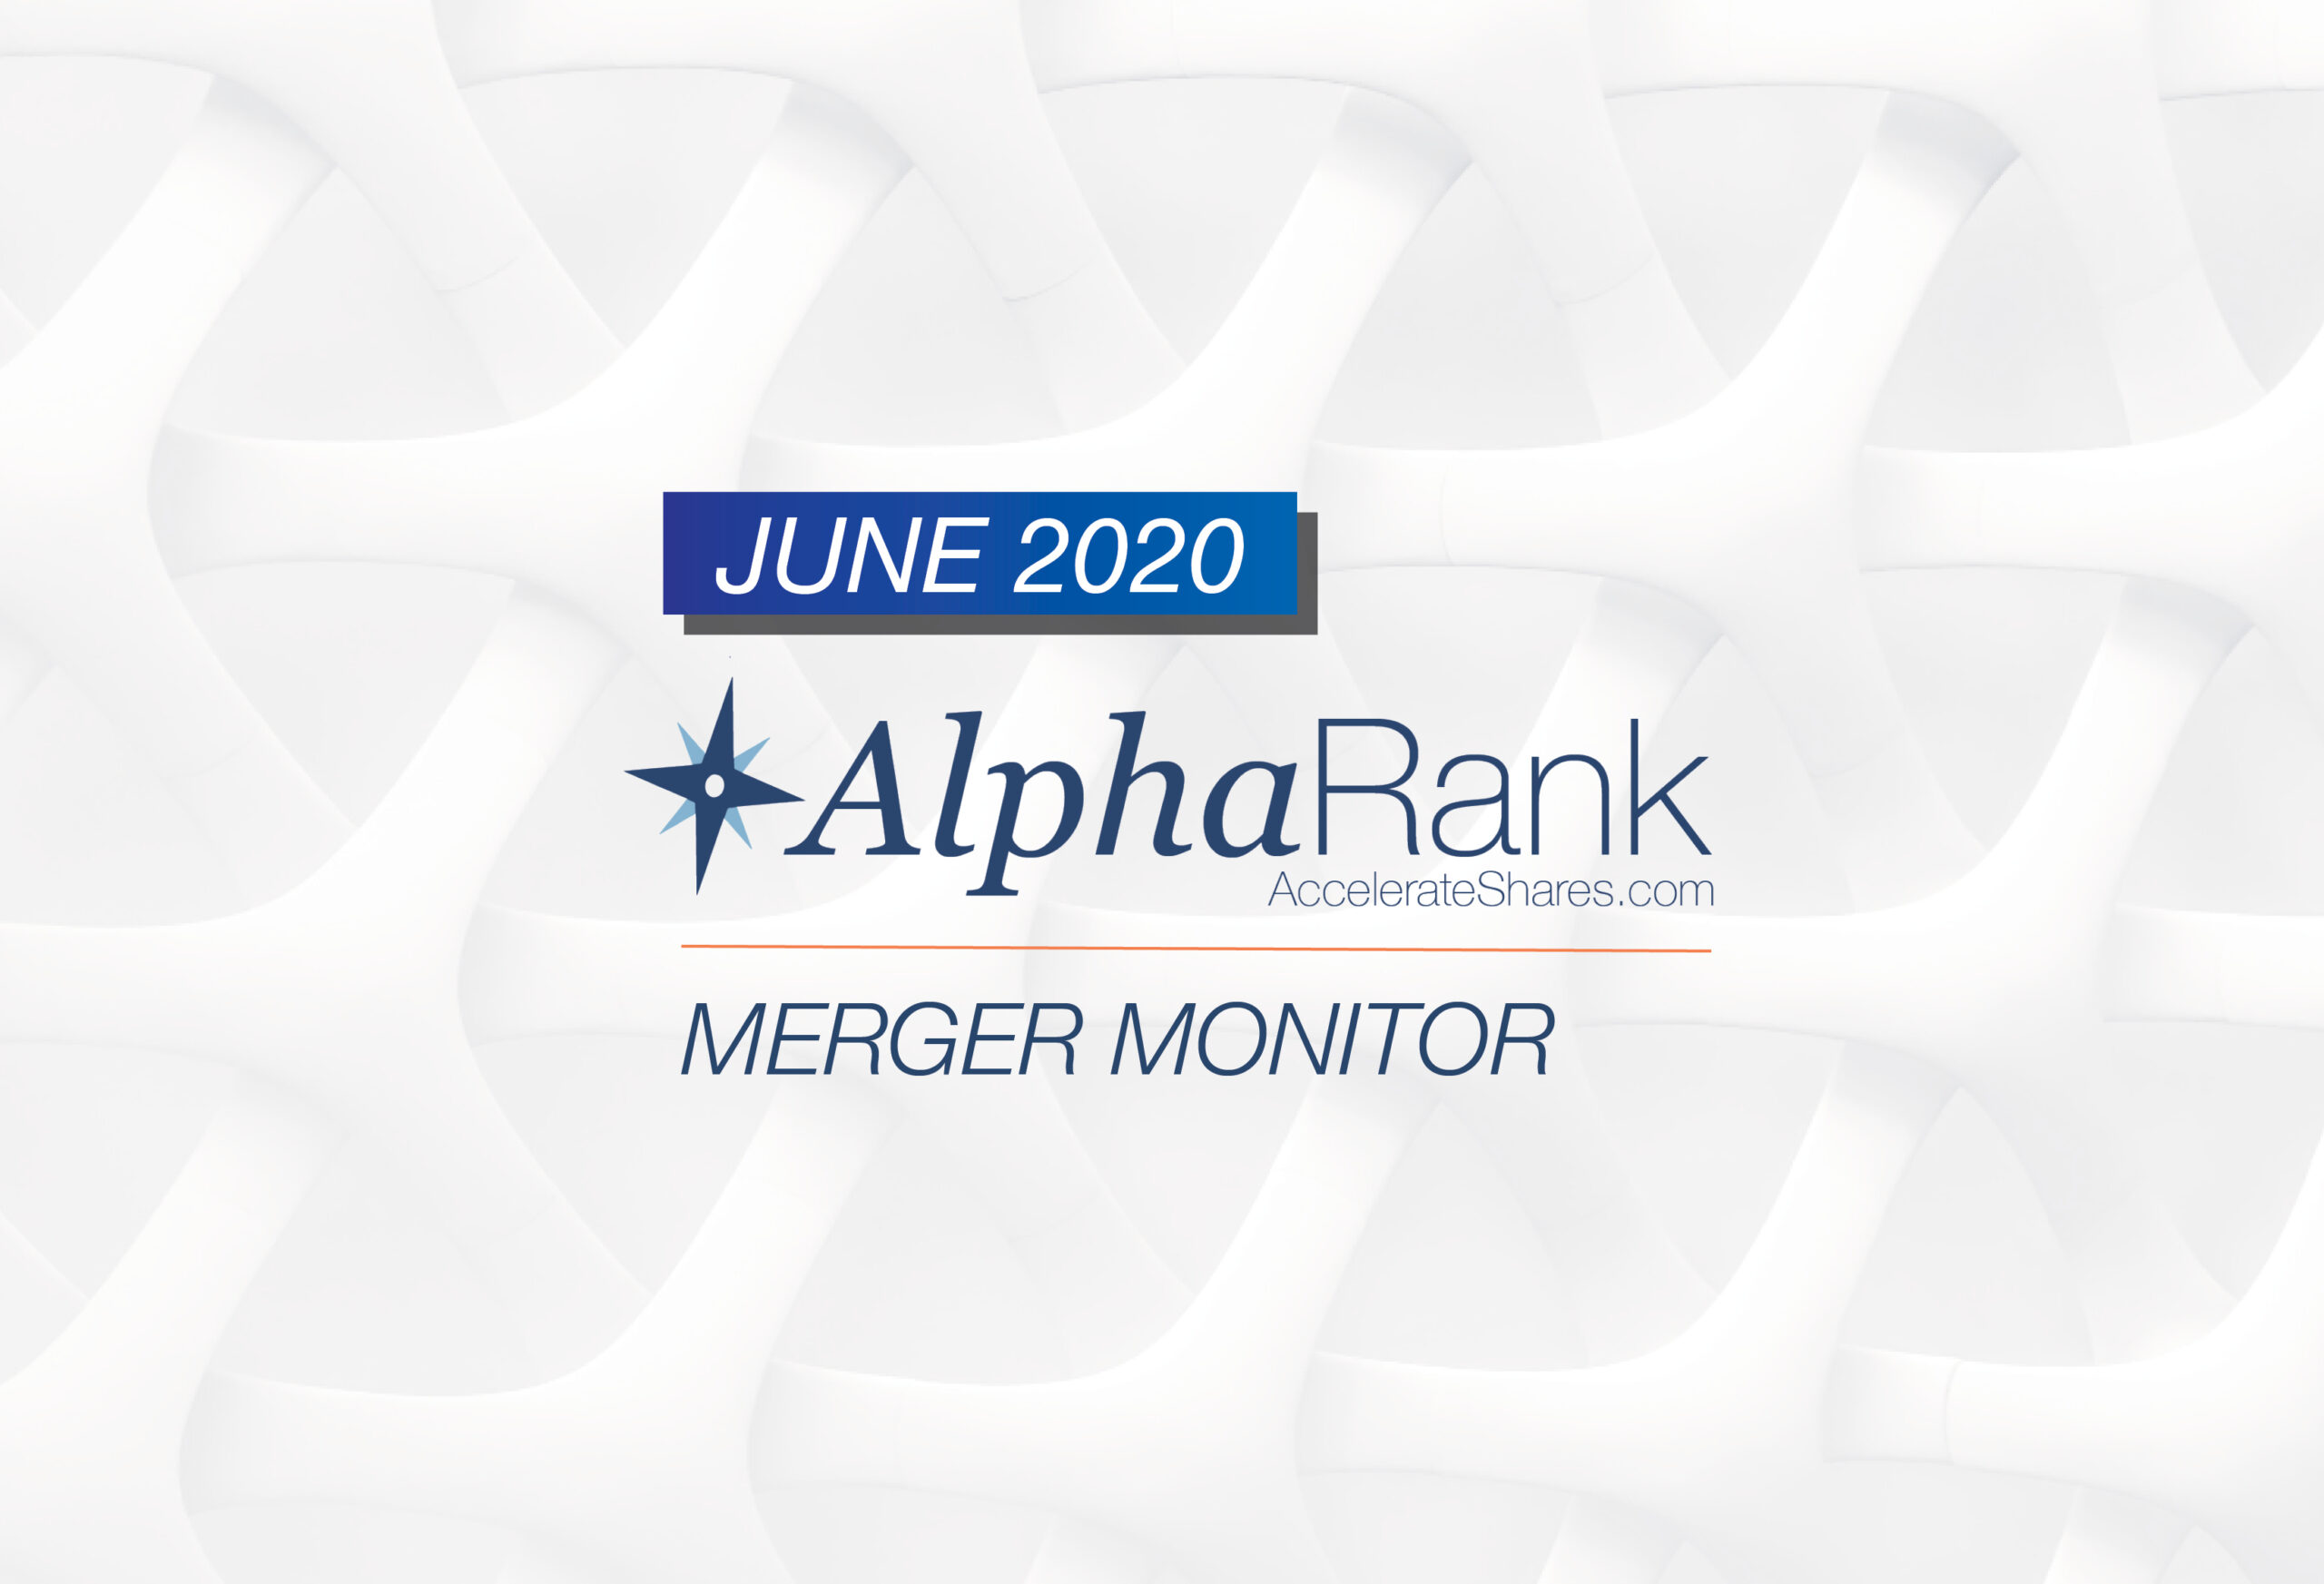 AlphaRank Merger Monitor – June 2020